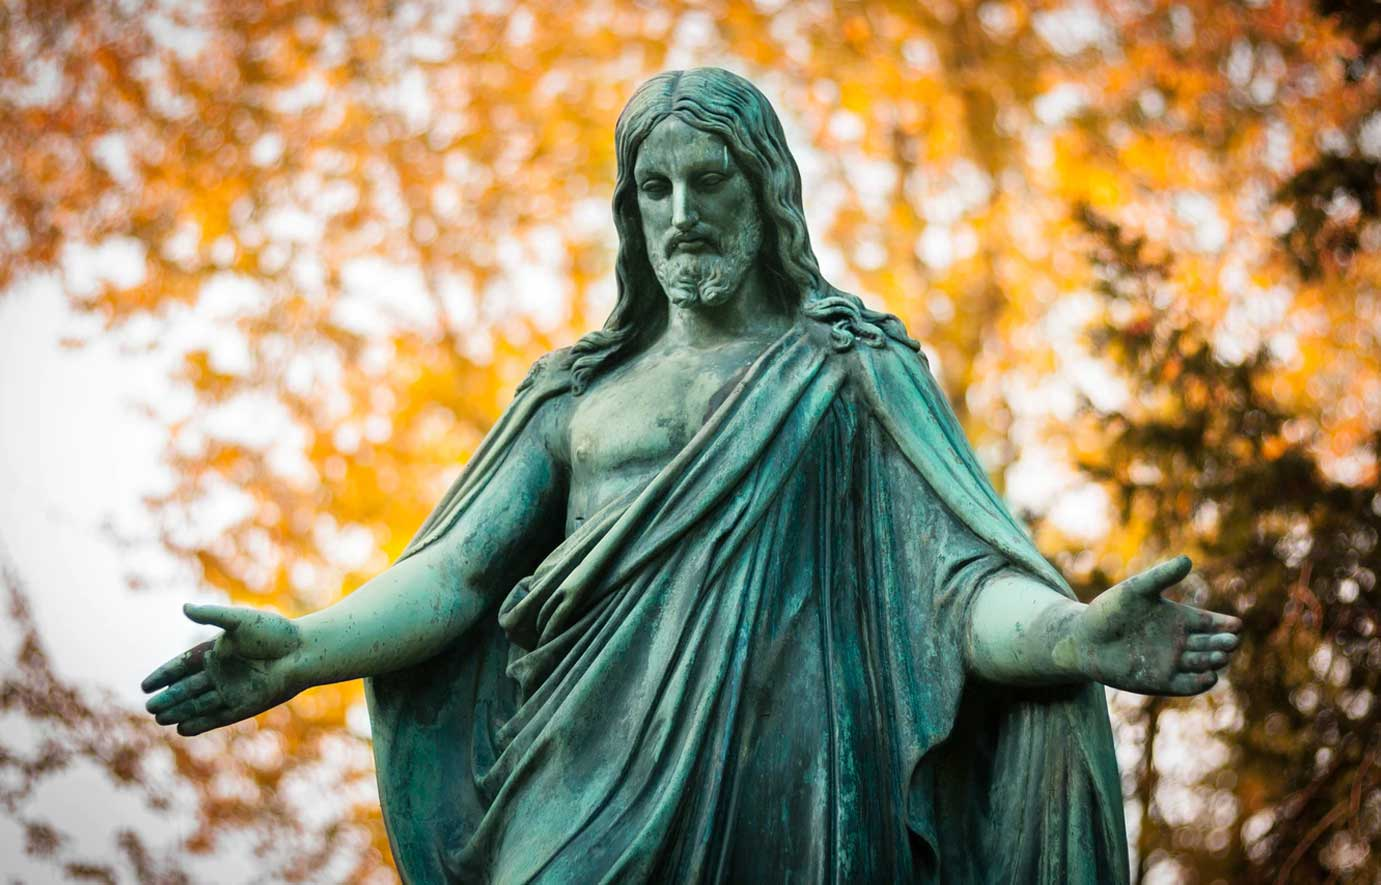 isai biri i merjemes, jezusi